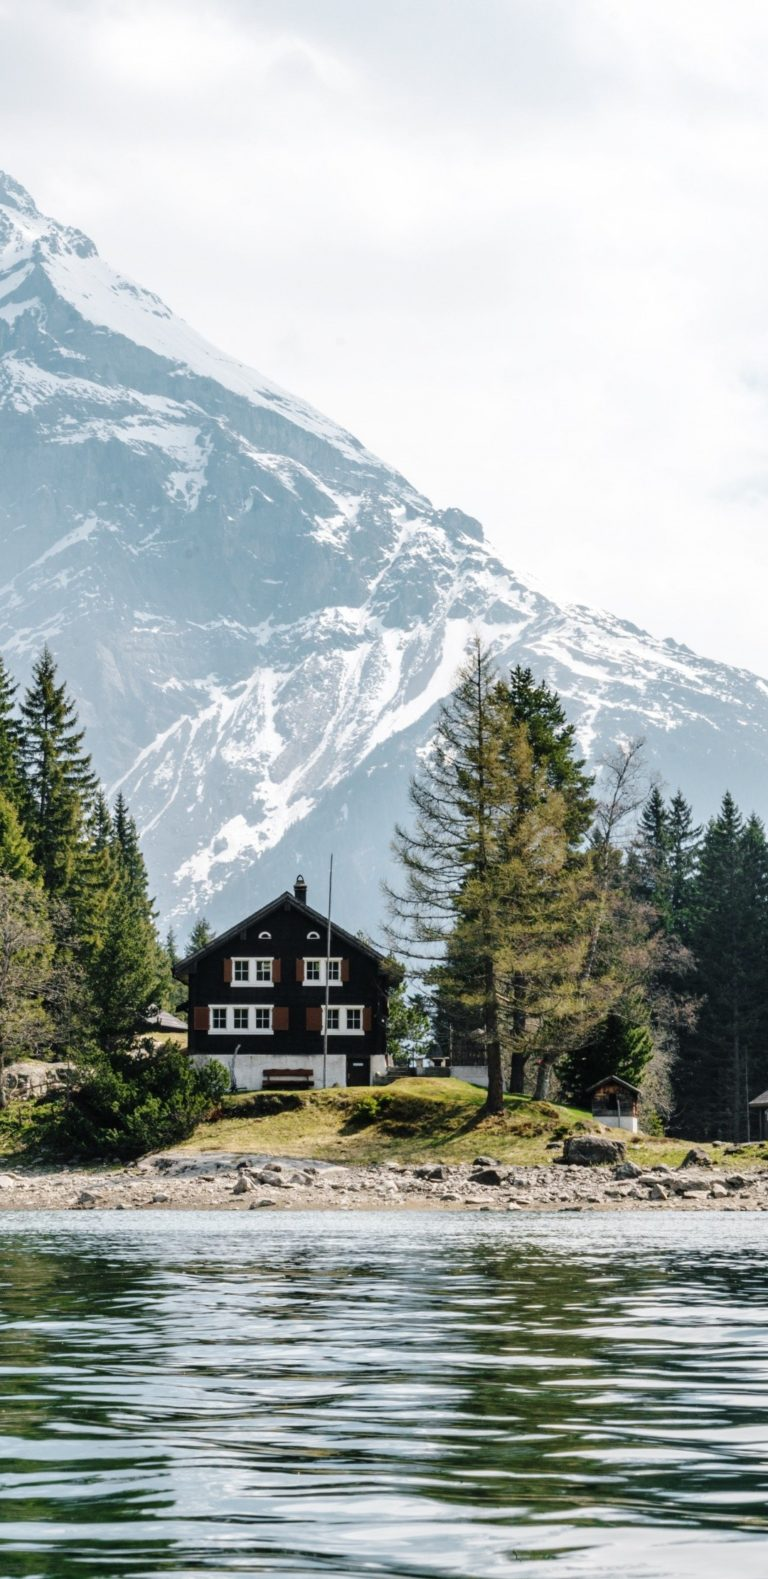 Clouds House Lake Landscape Mountain 1080x2220 768x1579